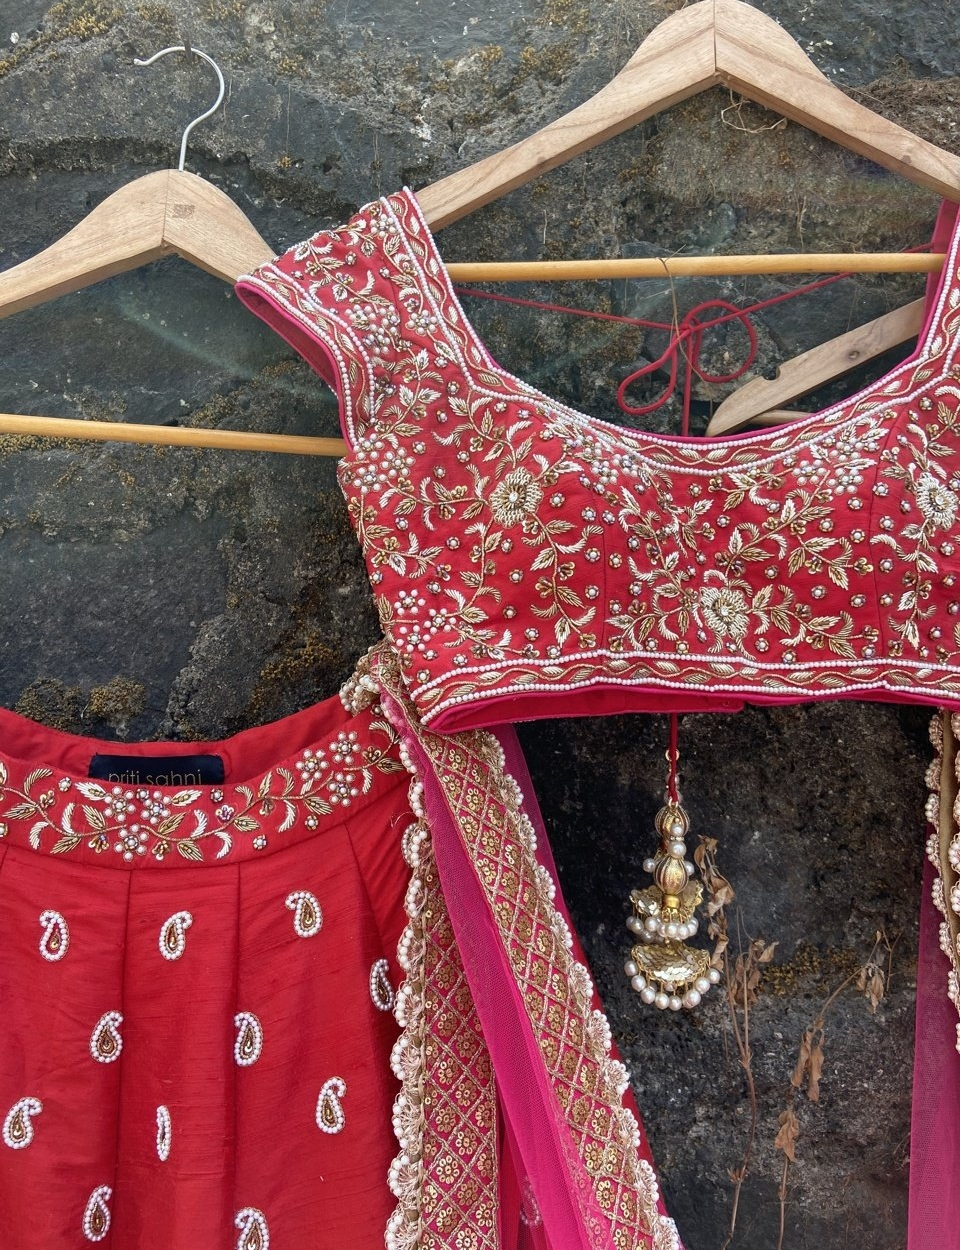 Red and Pink Bridal Lehenga Set - Fashion Brand & Designer Priti Sahni 2